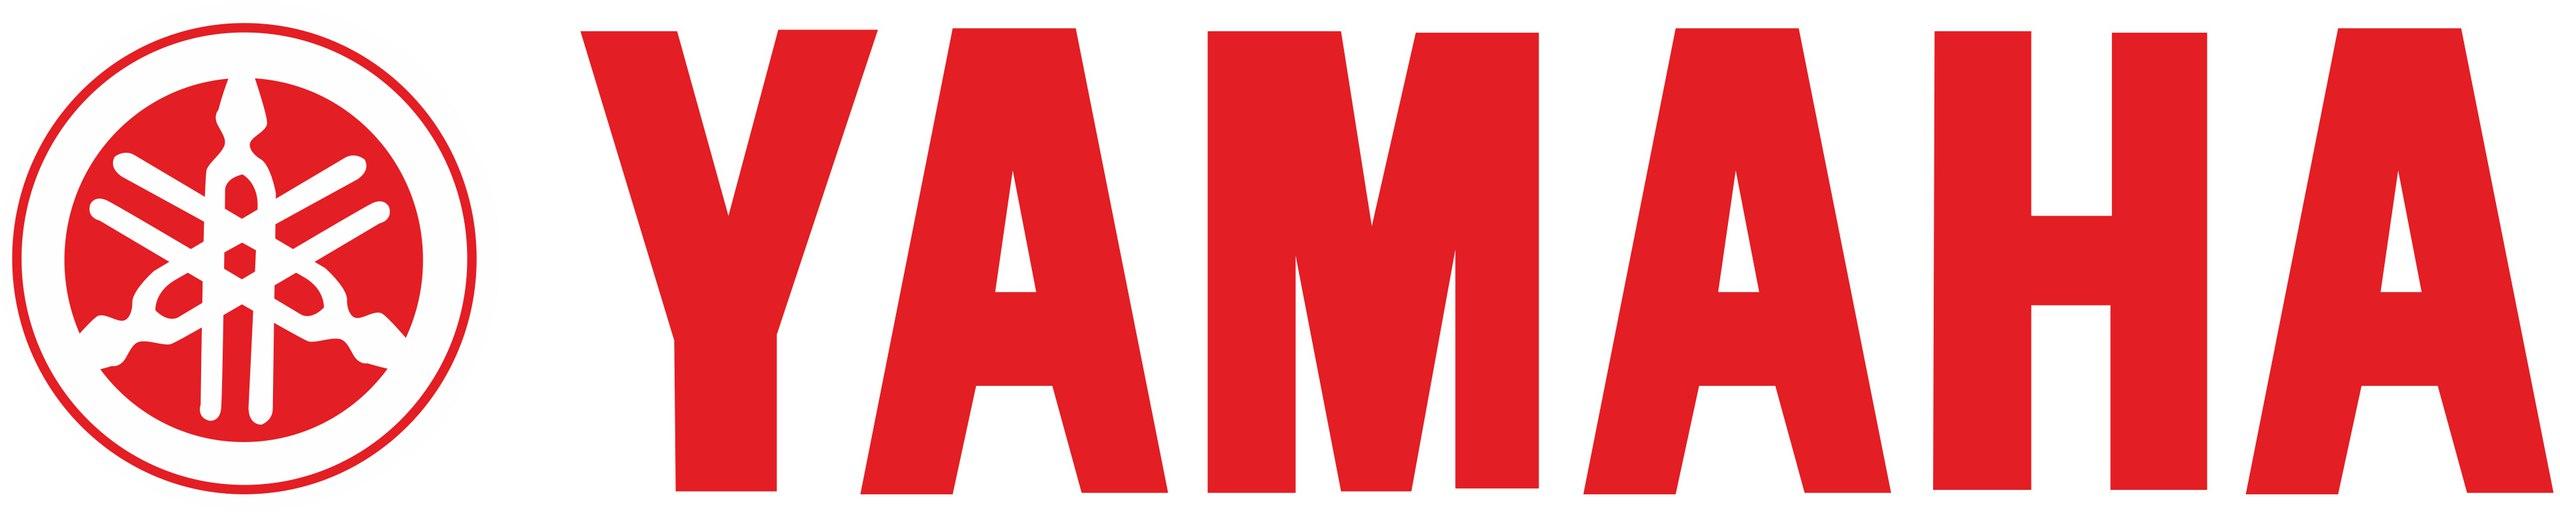 Yamaha Logo Design Free CDR Vectors Art